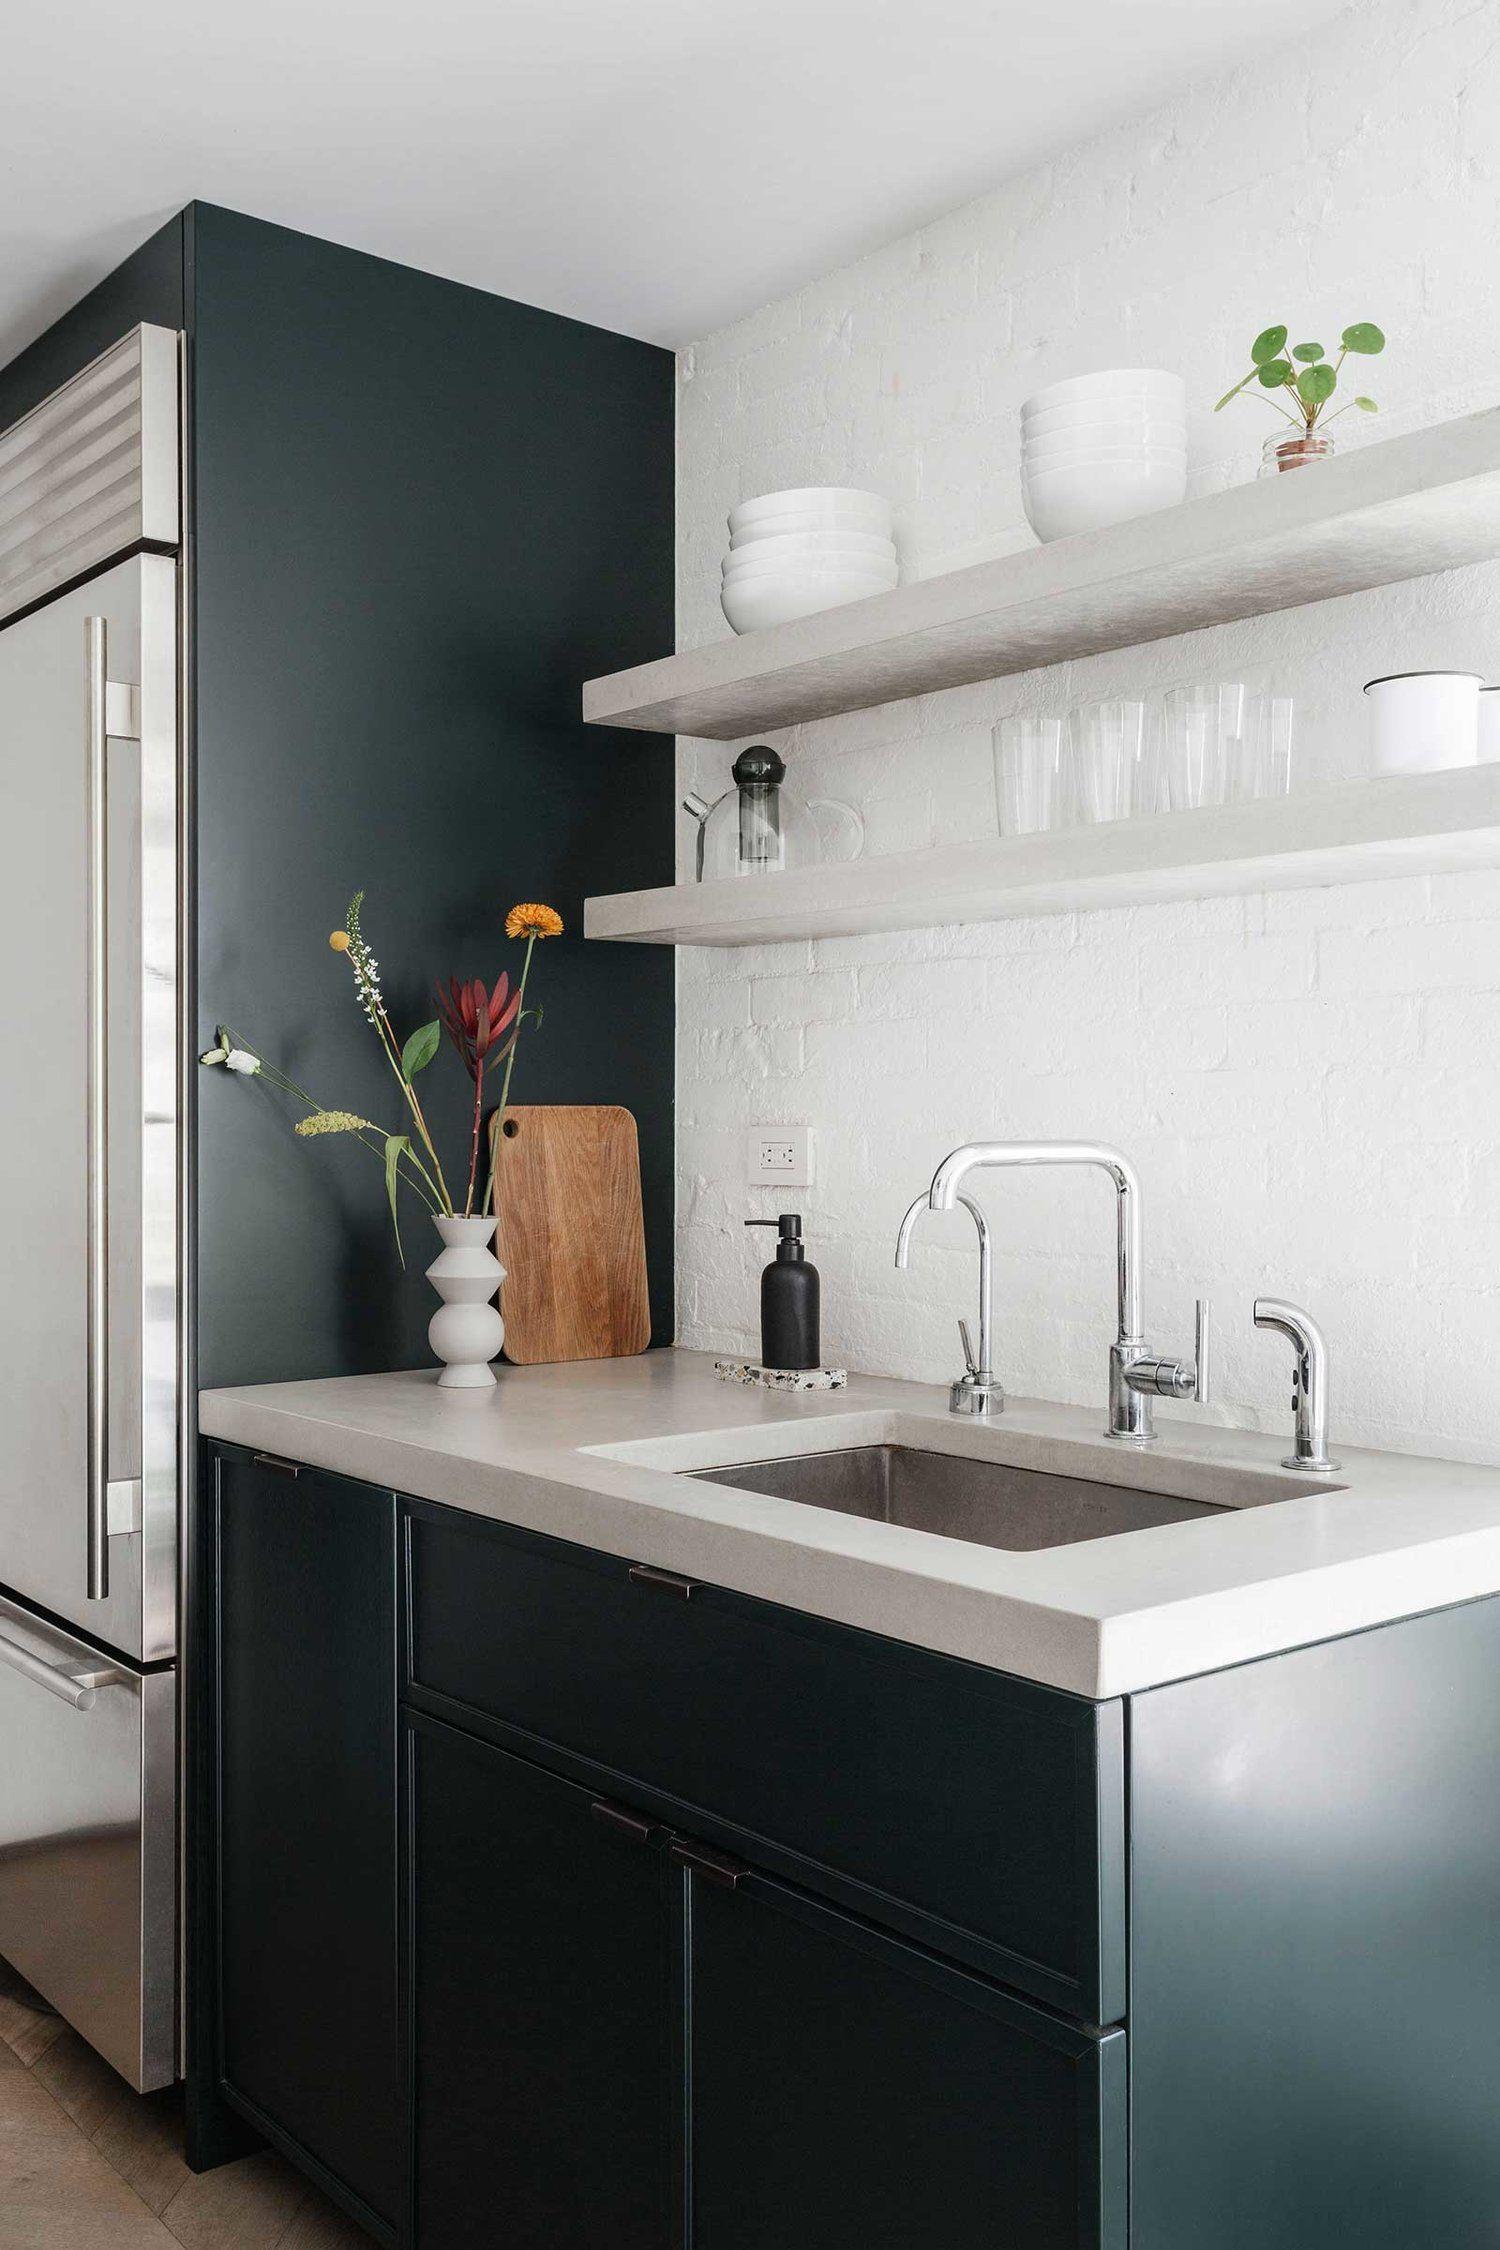 Common Comforts Kitchen sink design, Sink design, Small